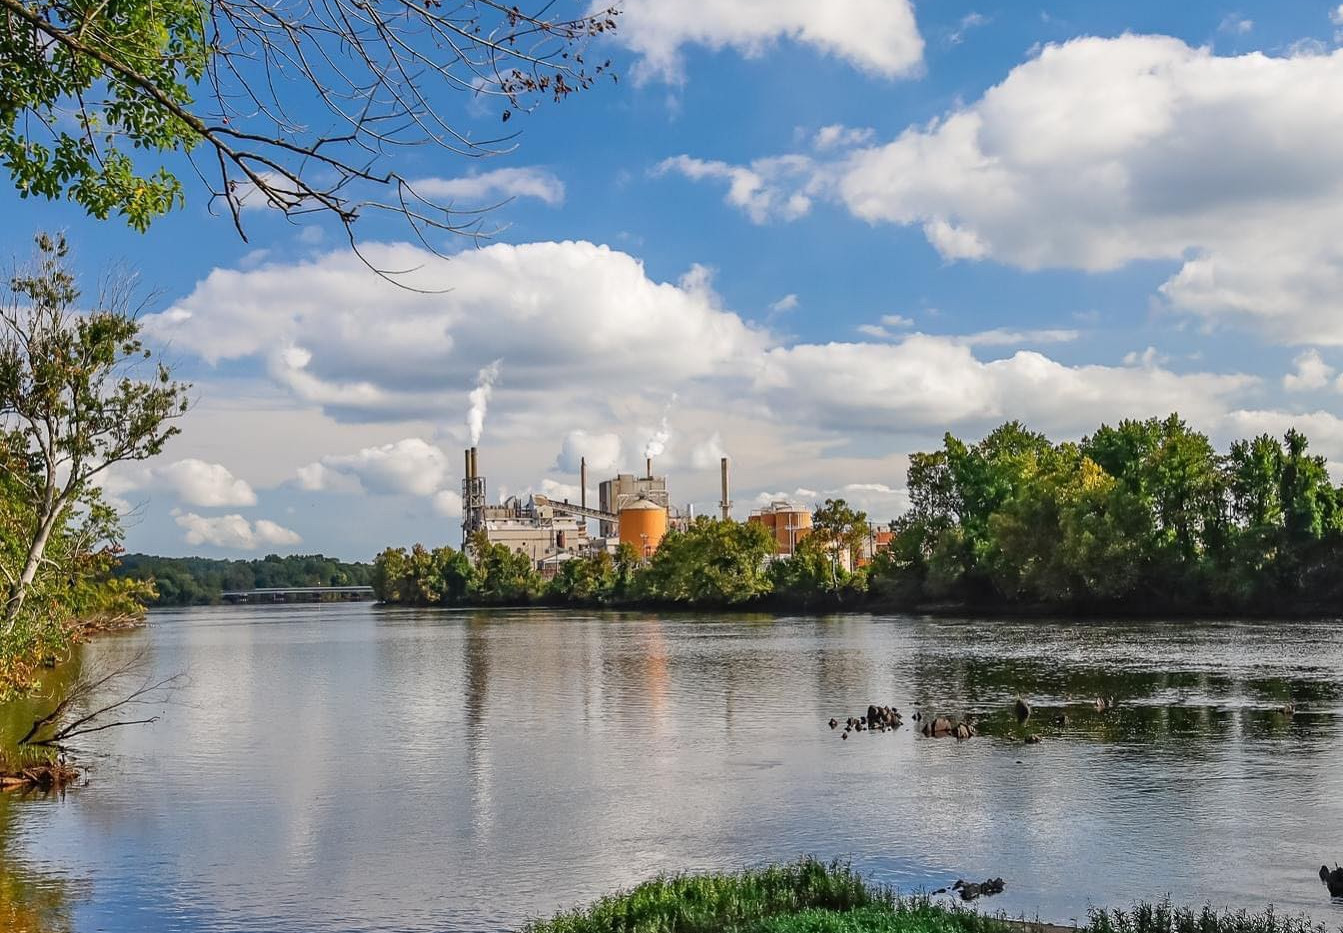 Roanoke Rapids